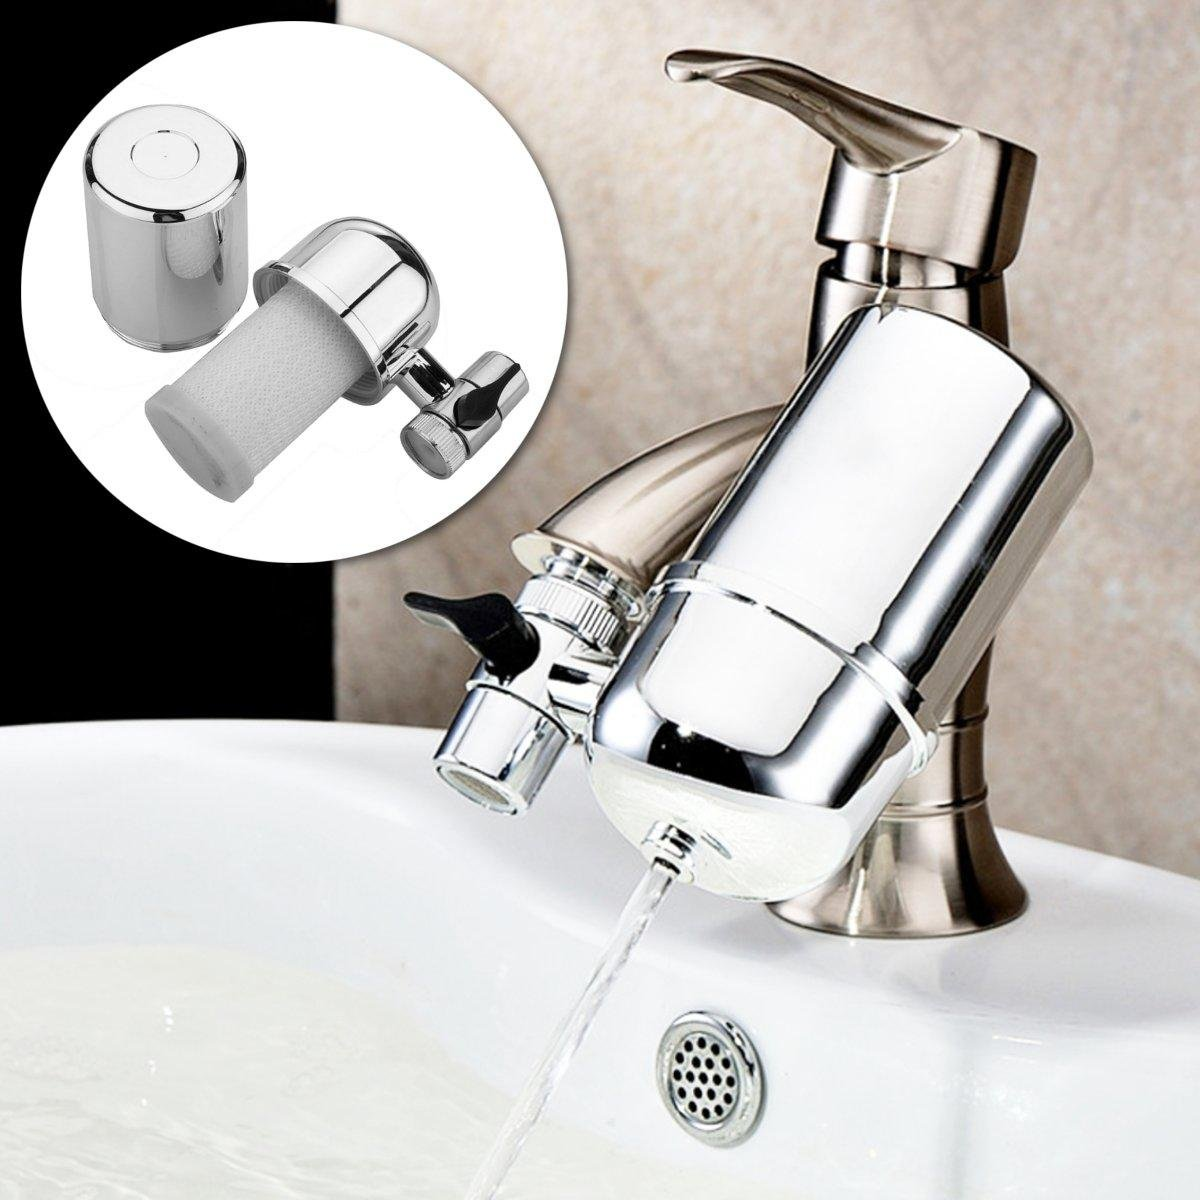 Kitchen Faucet Water Purifier - Bathroom Kitchen Water Filter Faucet Water Ionier Remove Water Contaminants Alkaline Tap Water Ceramic Cartridge Purifier (Faucet Water Purifier)